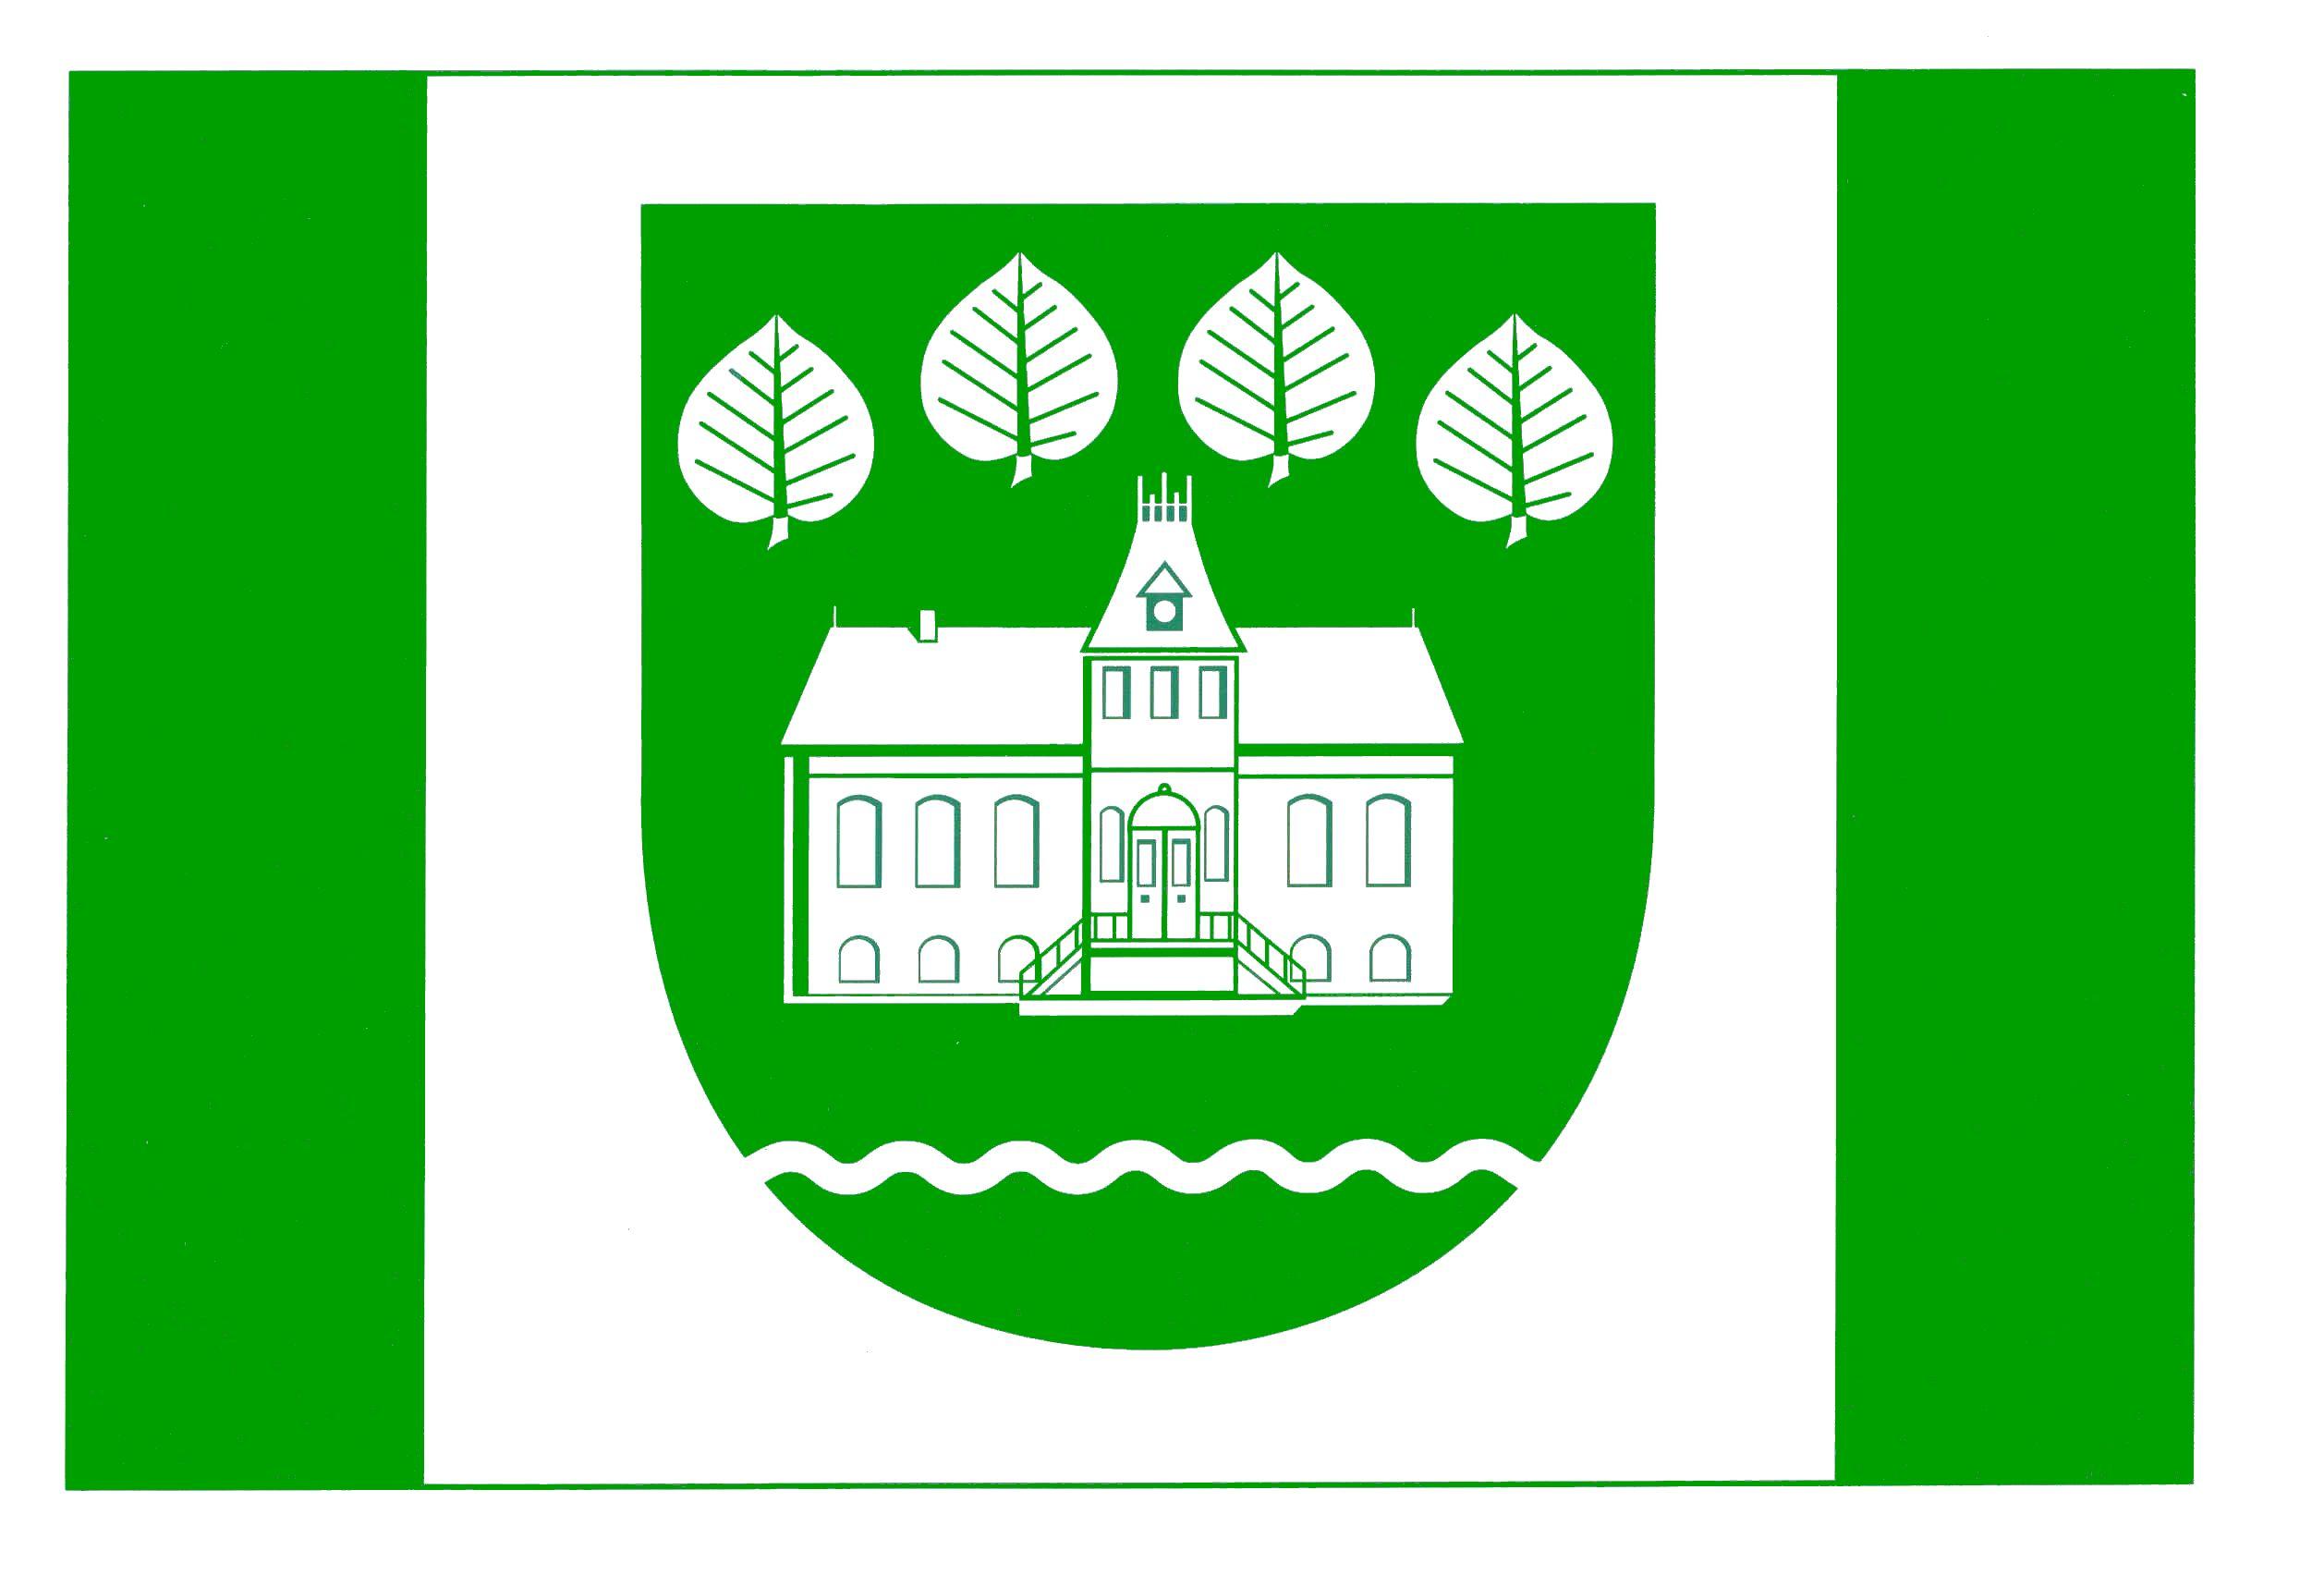 Flagge GemeindeBokhorst, Kreis Steinburg